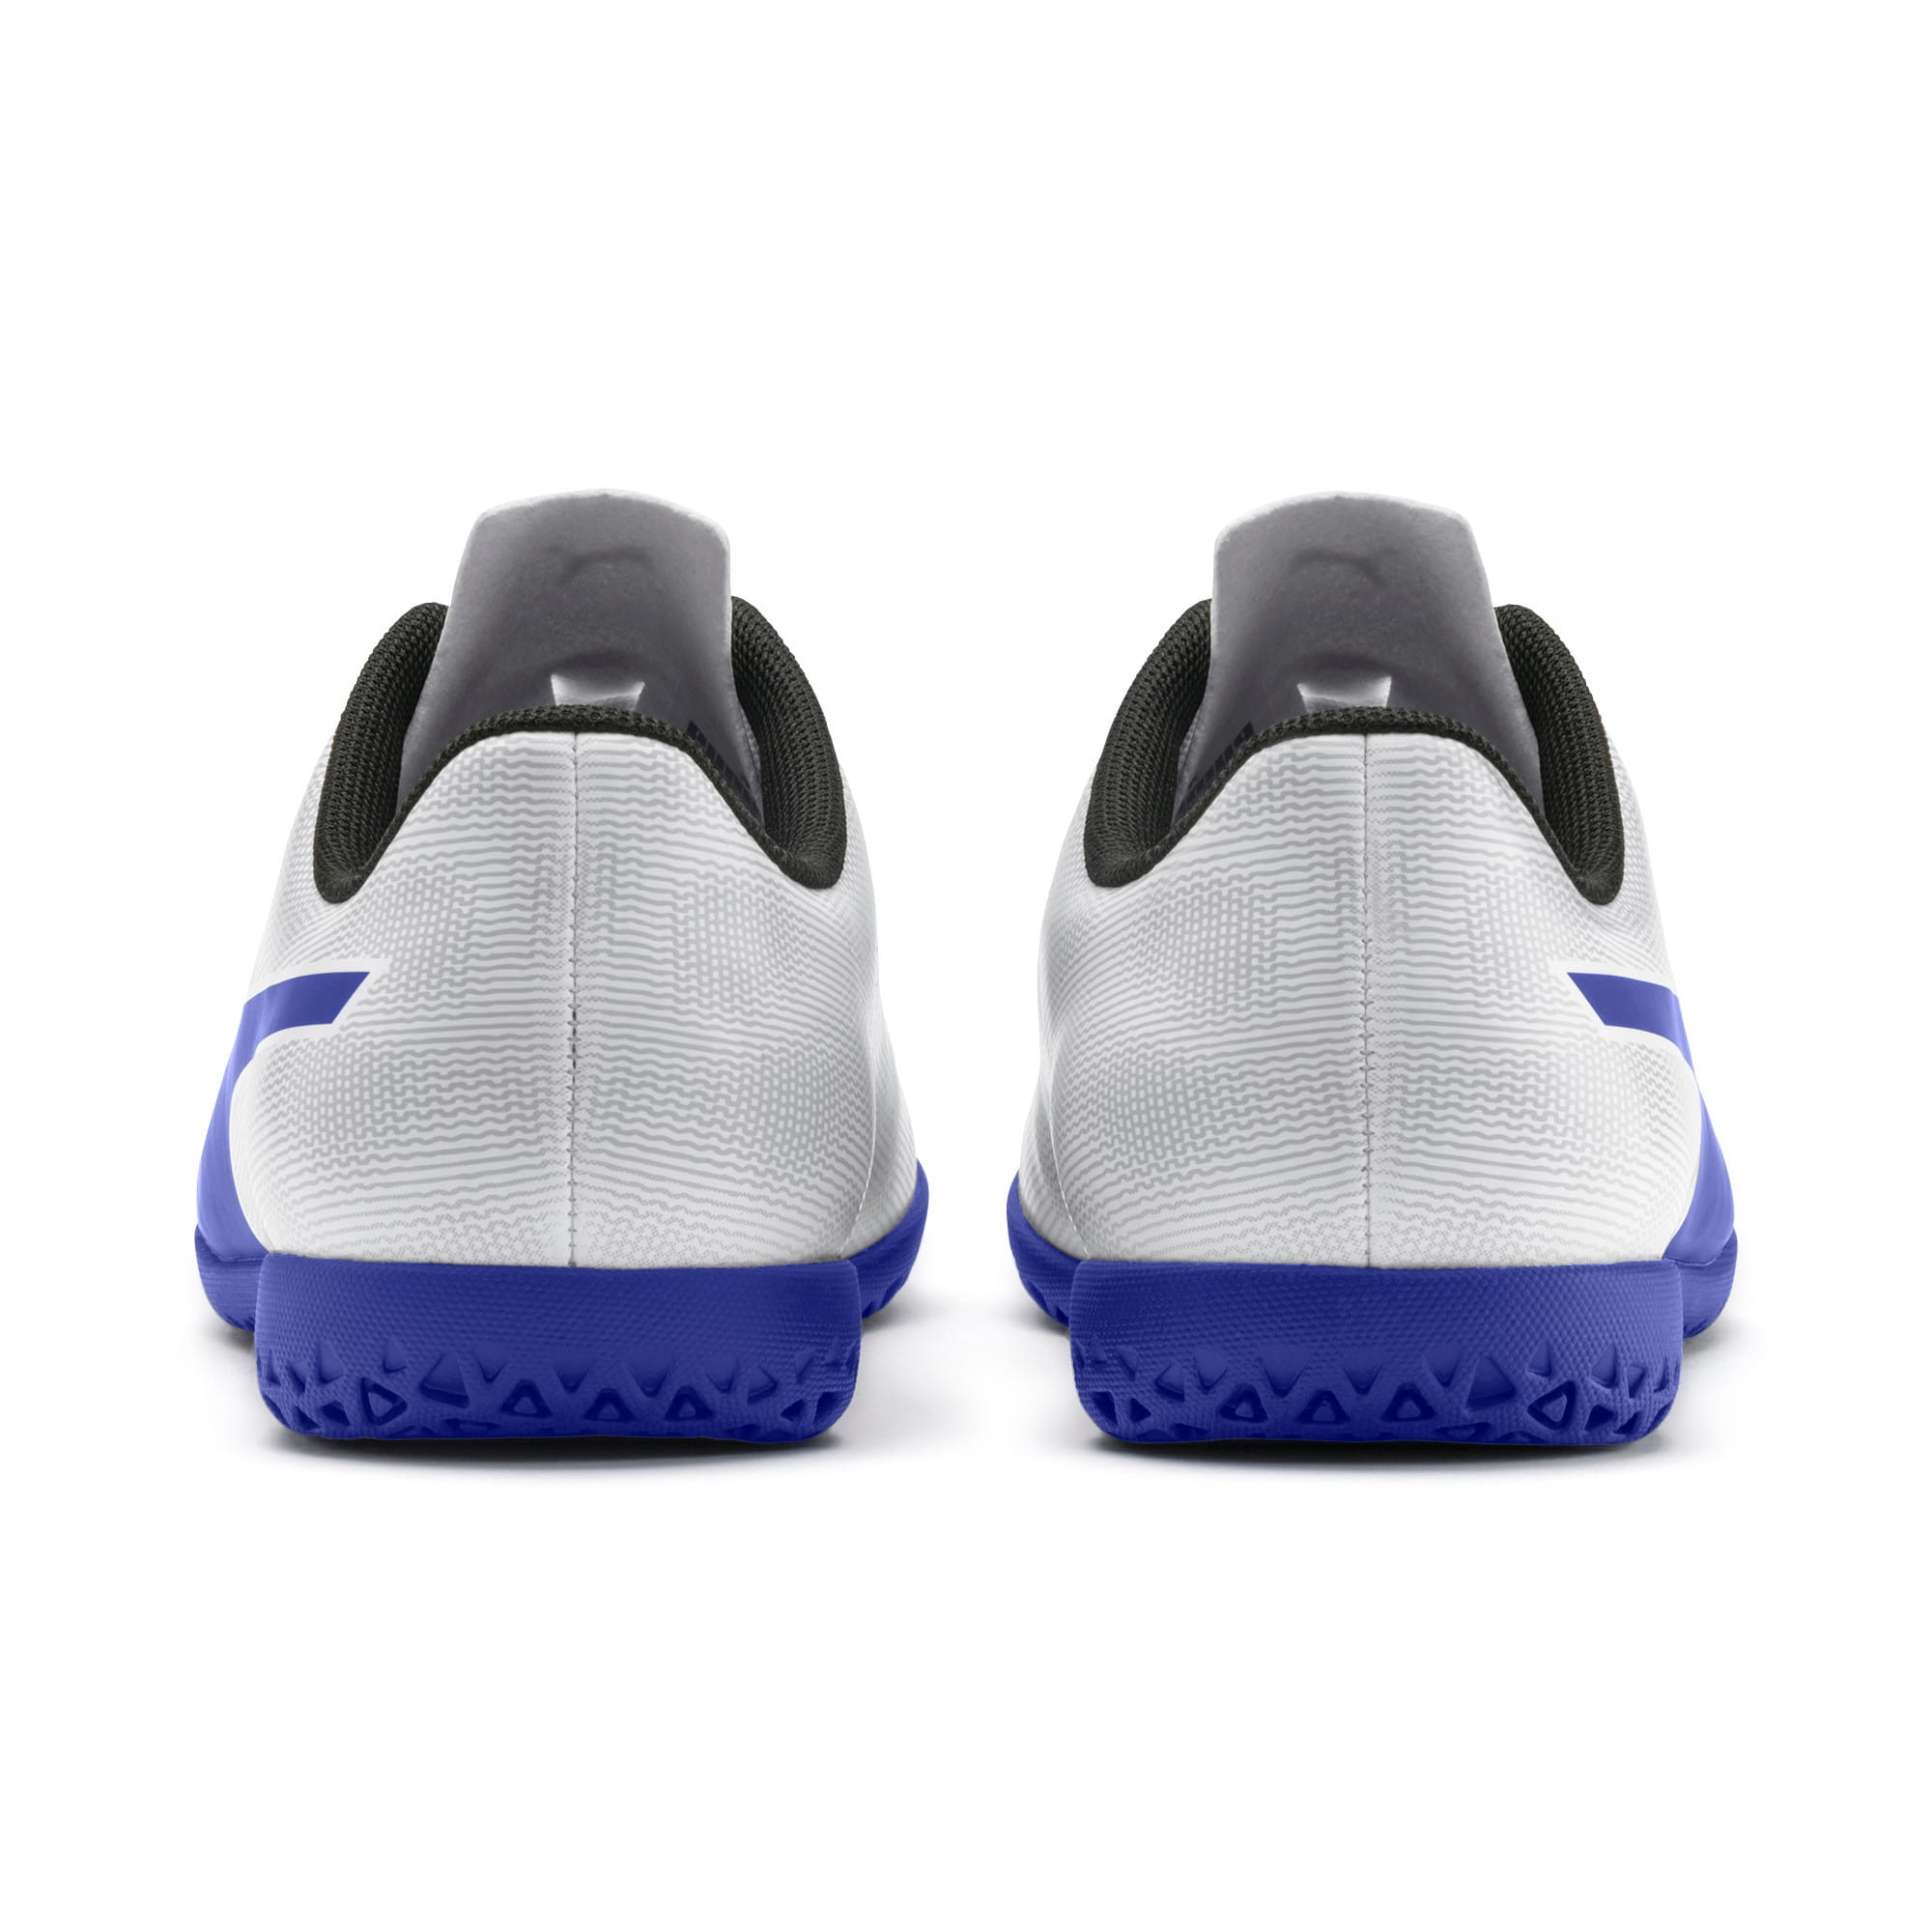 Thumbnail 3 of Rapido IT Boy's Soccer Shoes JR, White-Royal Blue-Light Gray, medium